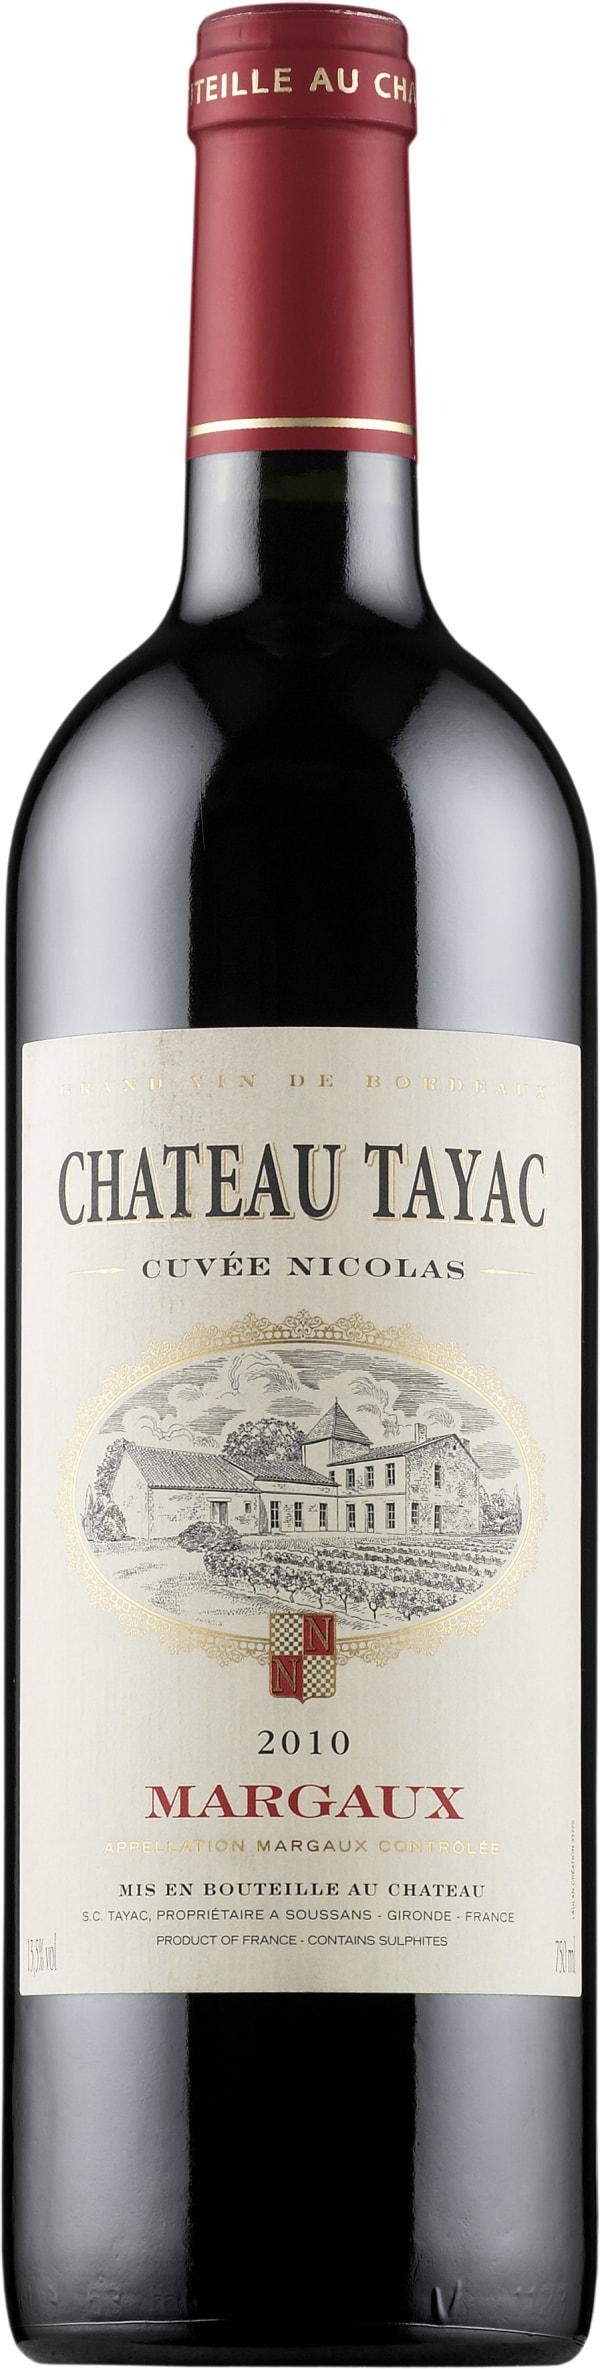 Château Tayac Cuvée Nicolas 2012